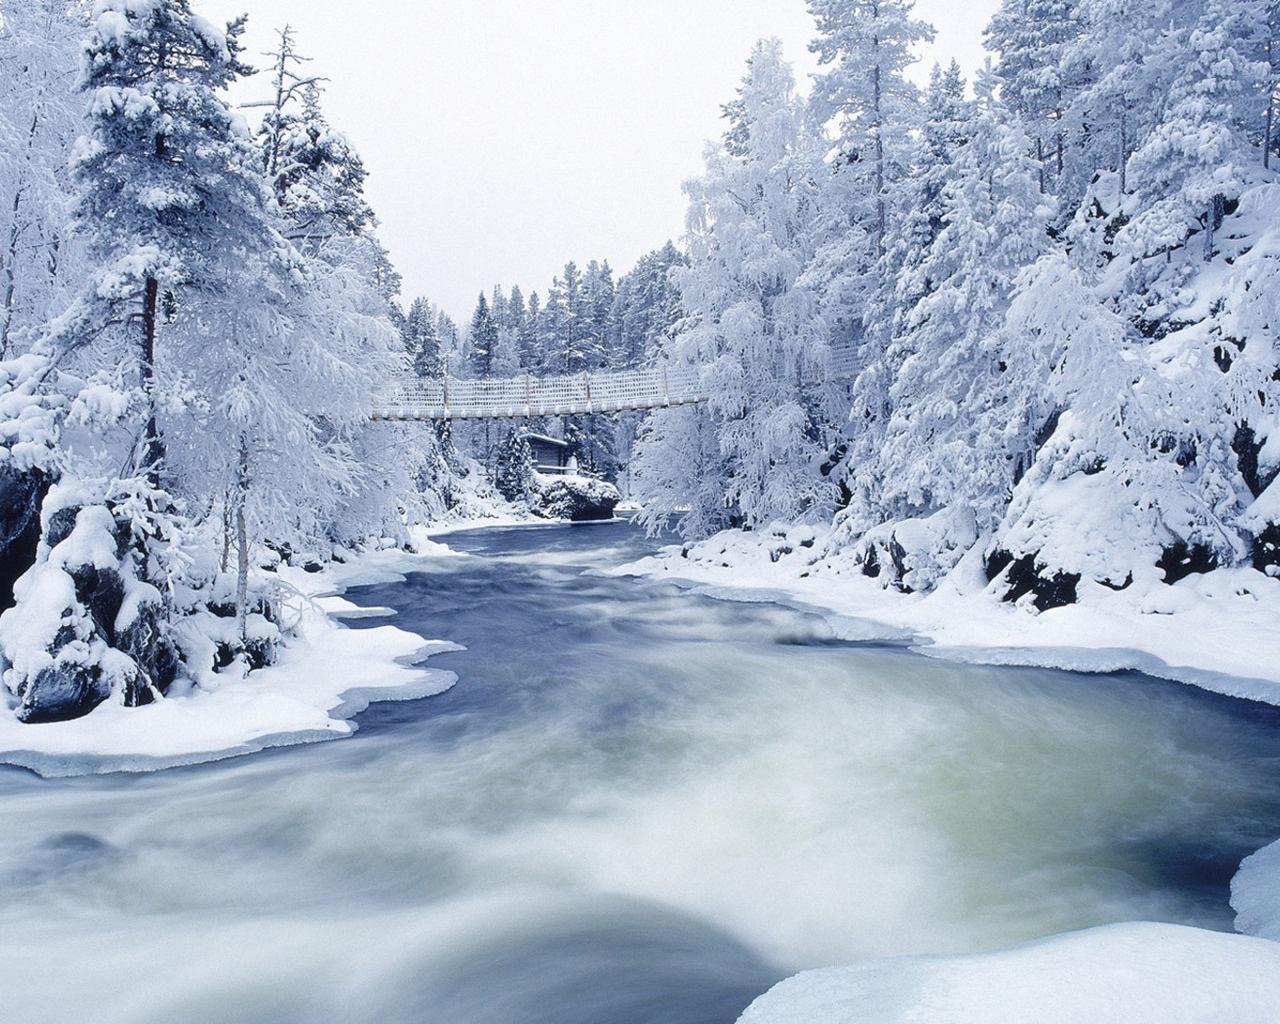 http://www.zastavki.com/pictures/1280x1024/2010/Winter_wallpapers_Winter_Forest_019431_.jpg